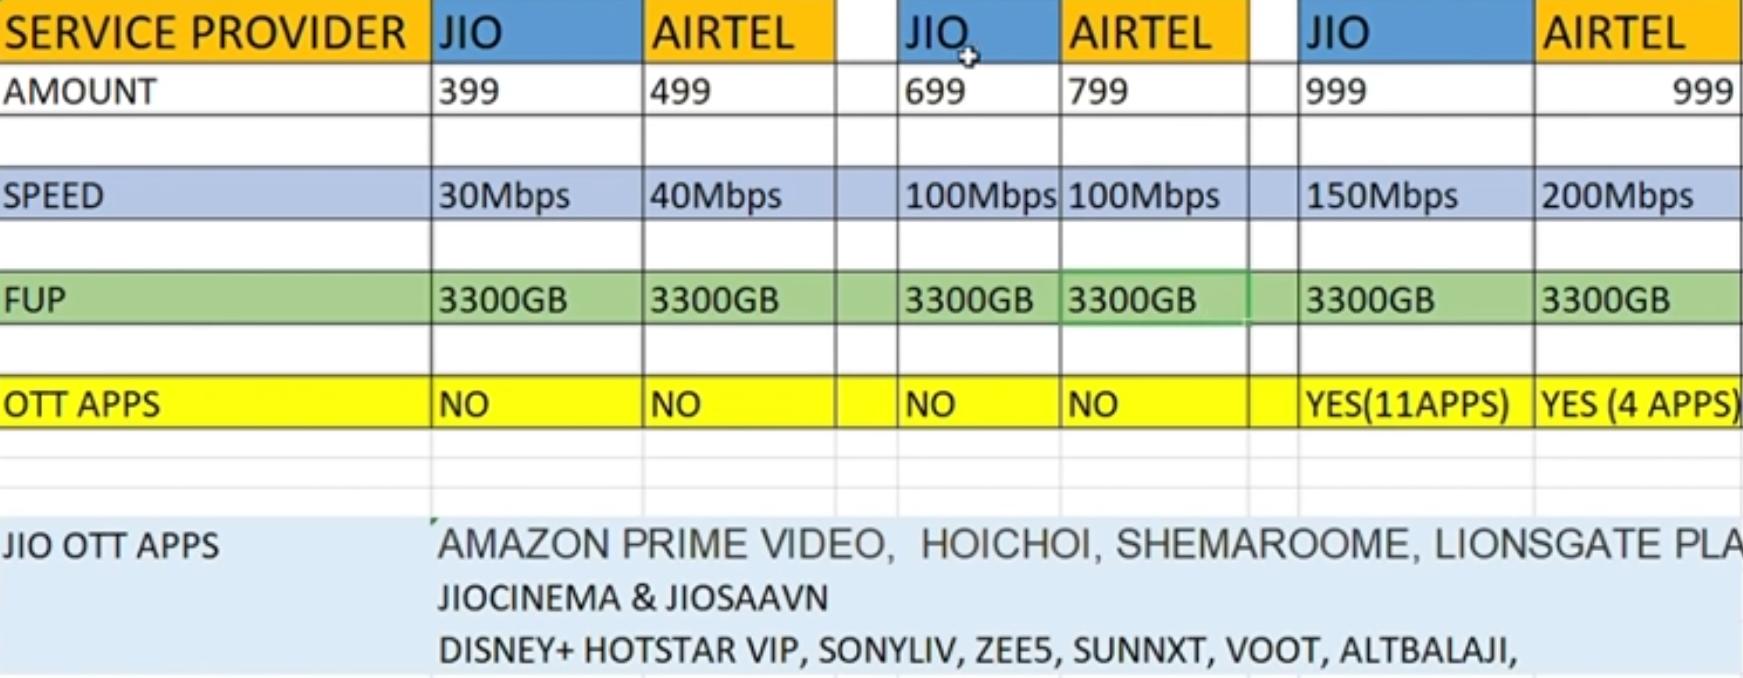 Airtel Xstream Vs Jio Giga Fiber Best Broadband? In Tamil